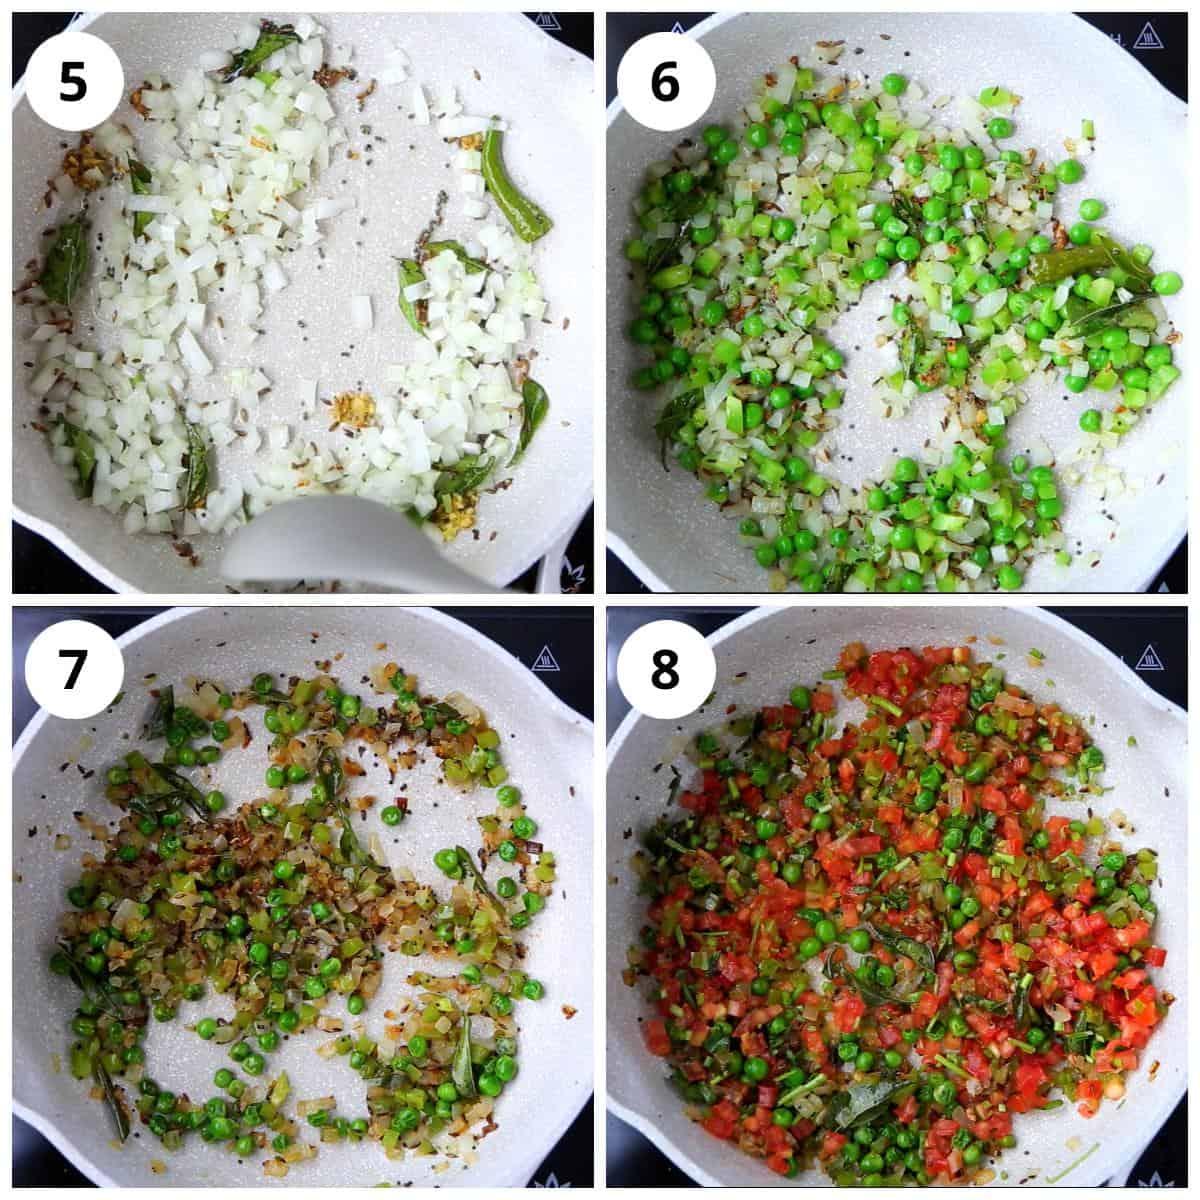 Steps for making onion tomato masala for bread upma